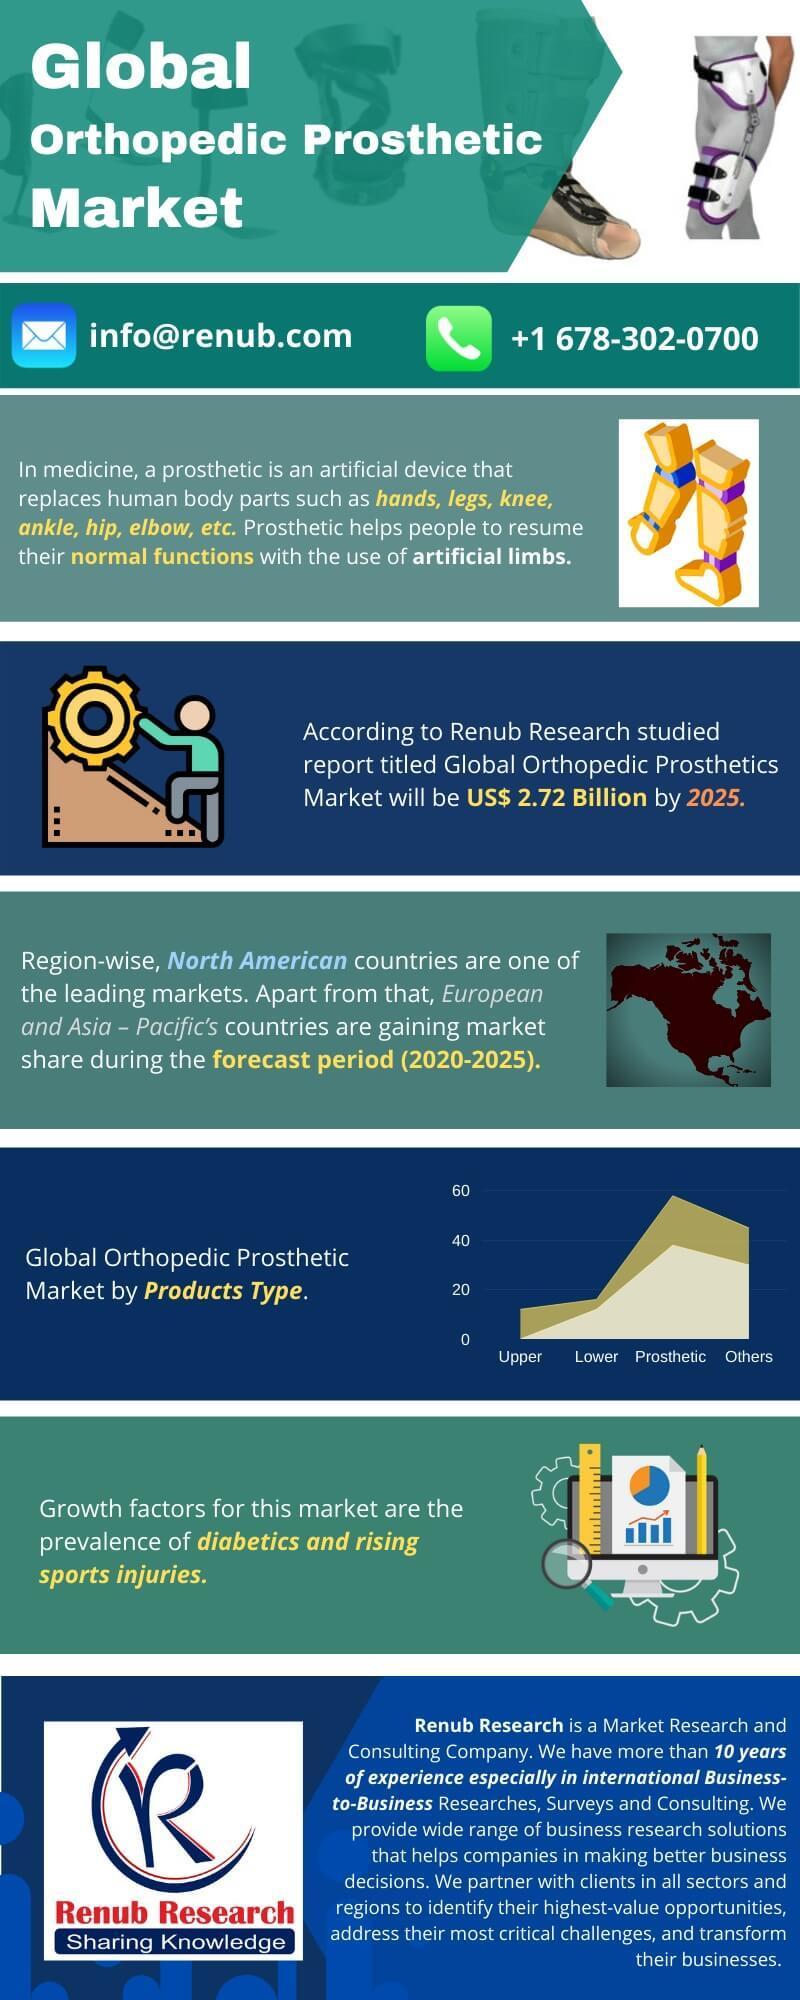 Global Orthopedic Prosthetics Market will be US$ 2.72 Billion